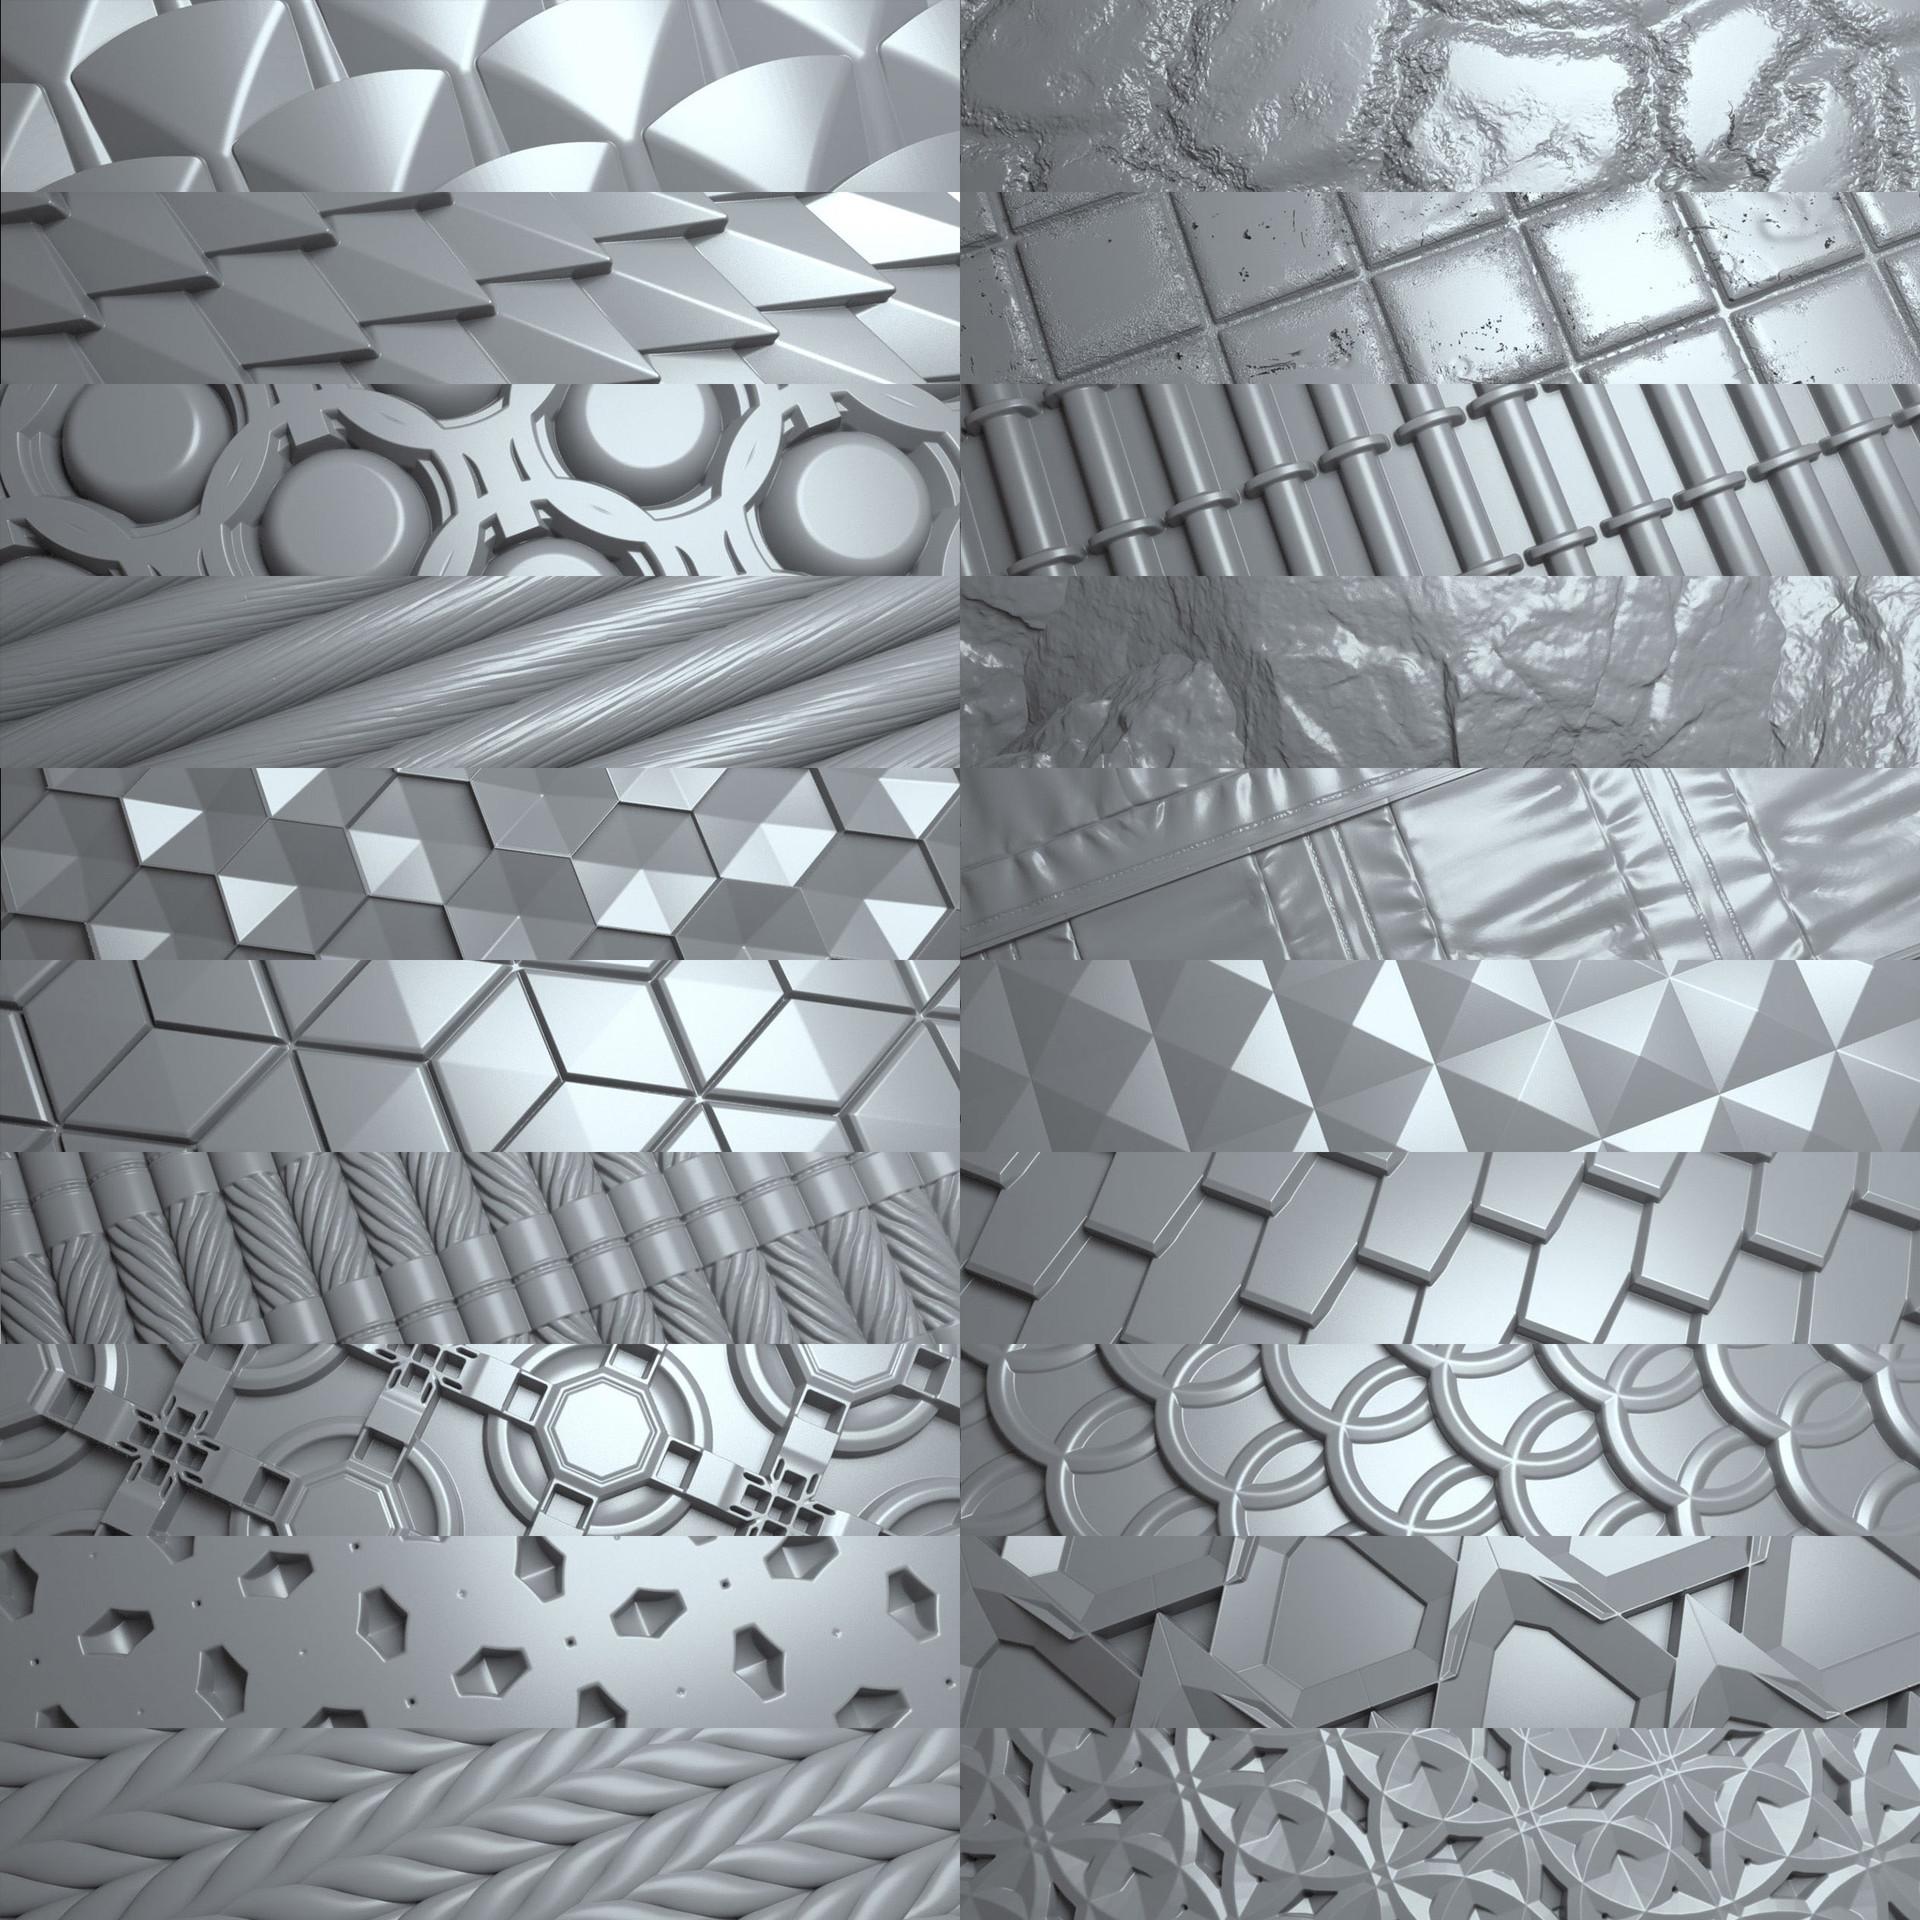 Travis davids 100 tileable displacement patterns preview 5